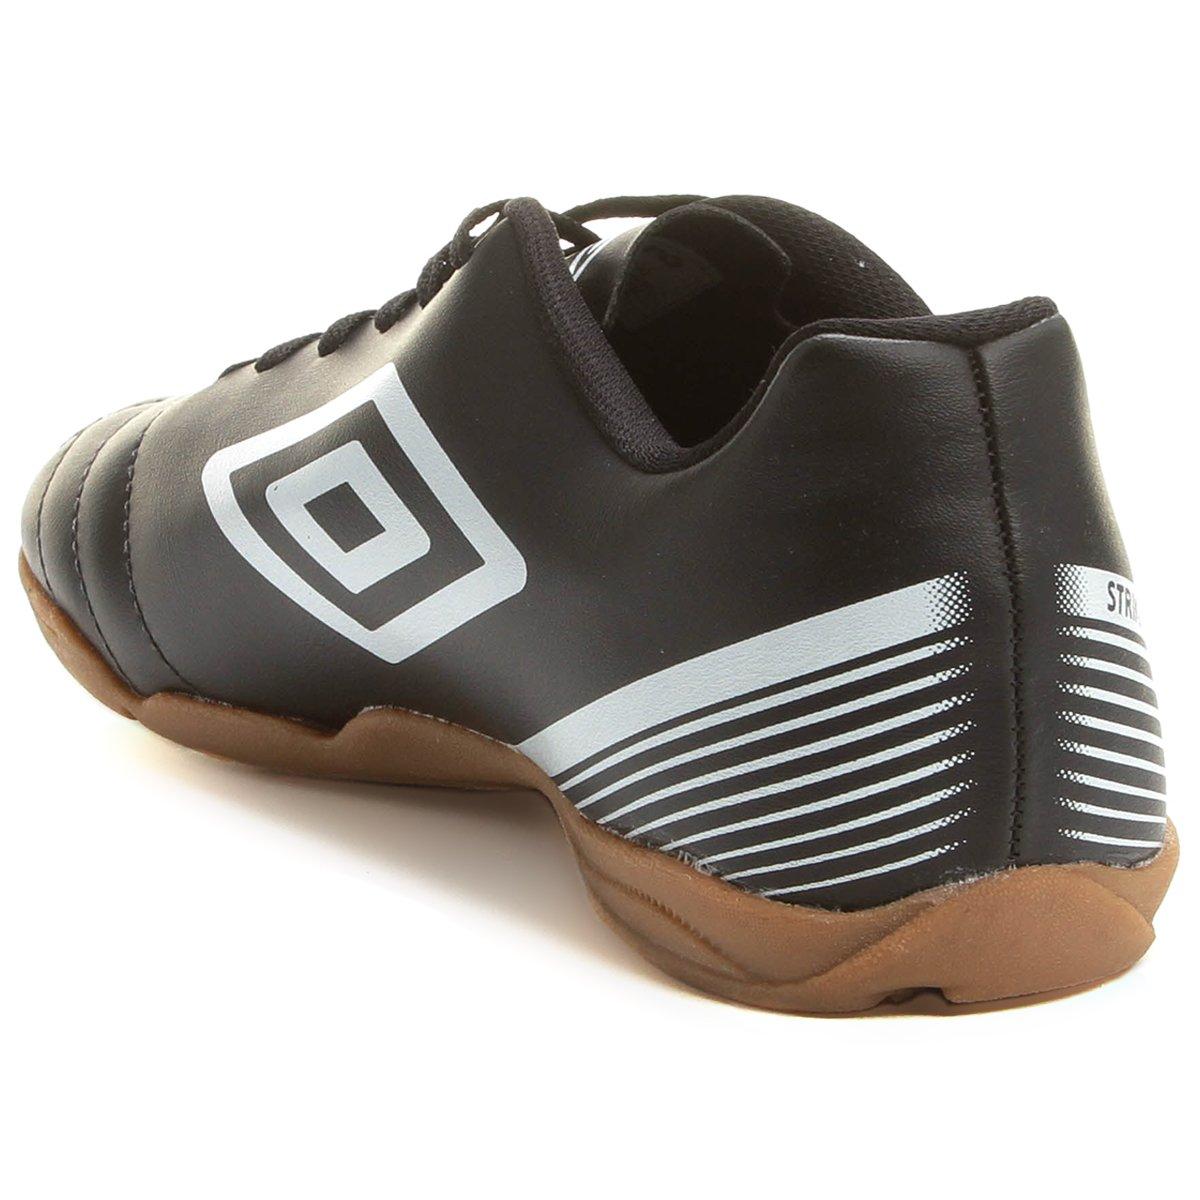 Chuteira Futsal Umbro Striker 3 Masculina - Compre Agora  6f0d88cbe41ab